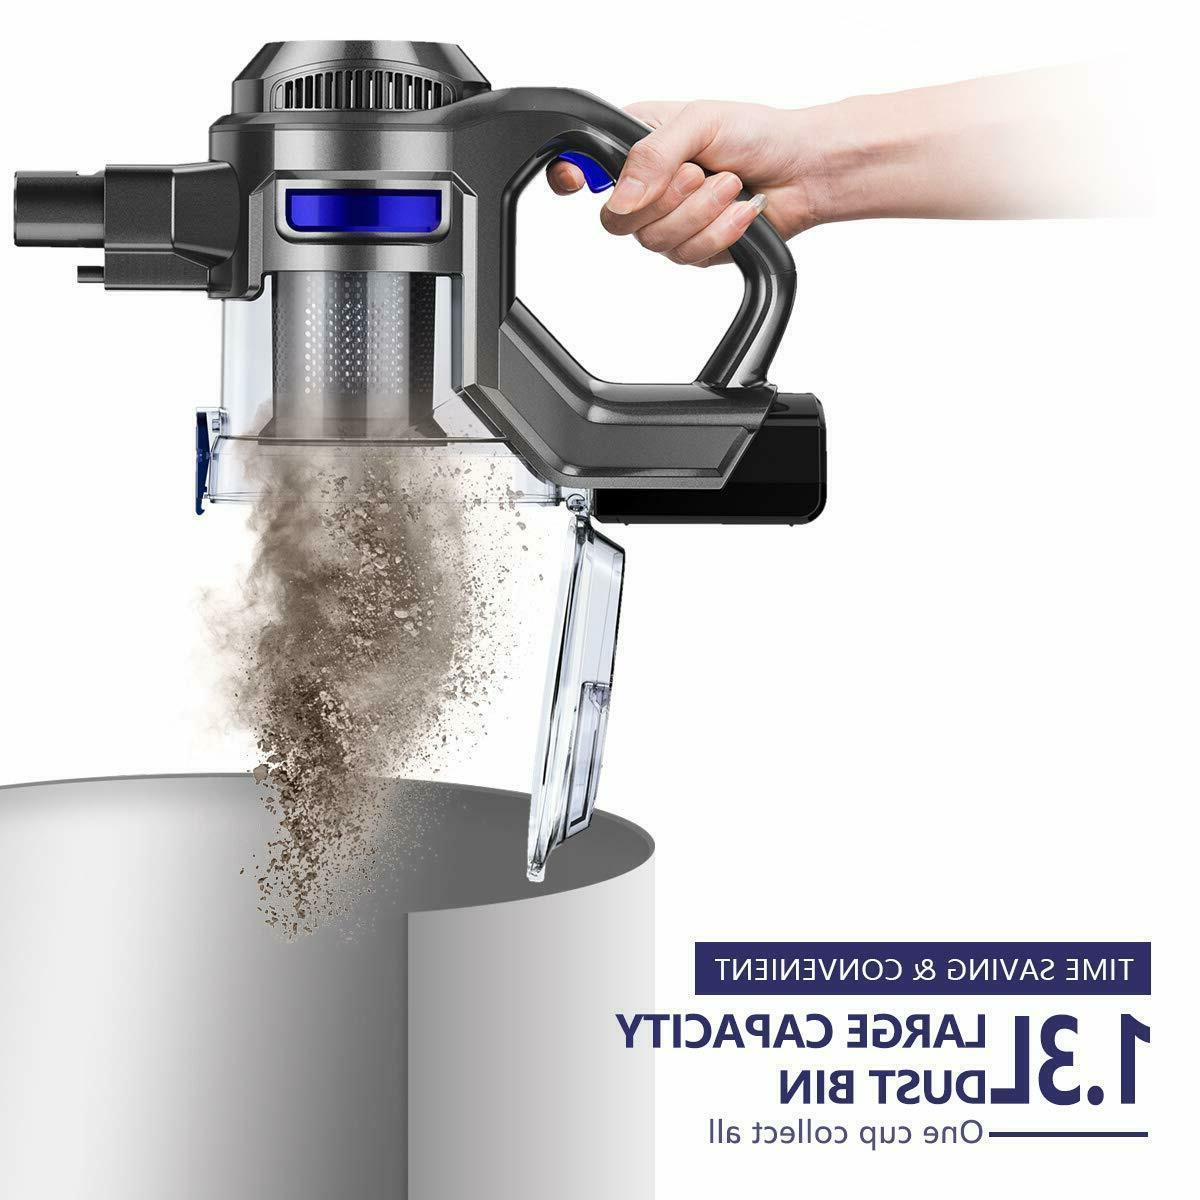 MOOSOO XL-618 10Kpa 4 in Stick Vacuum Carpet